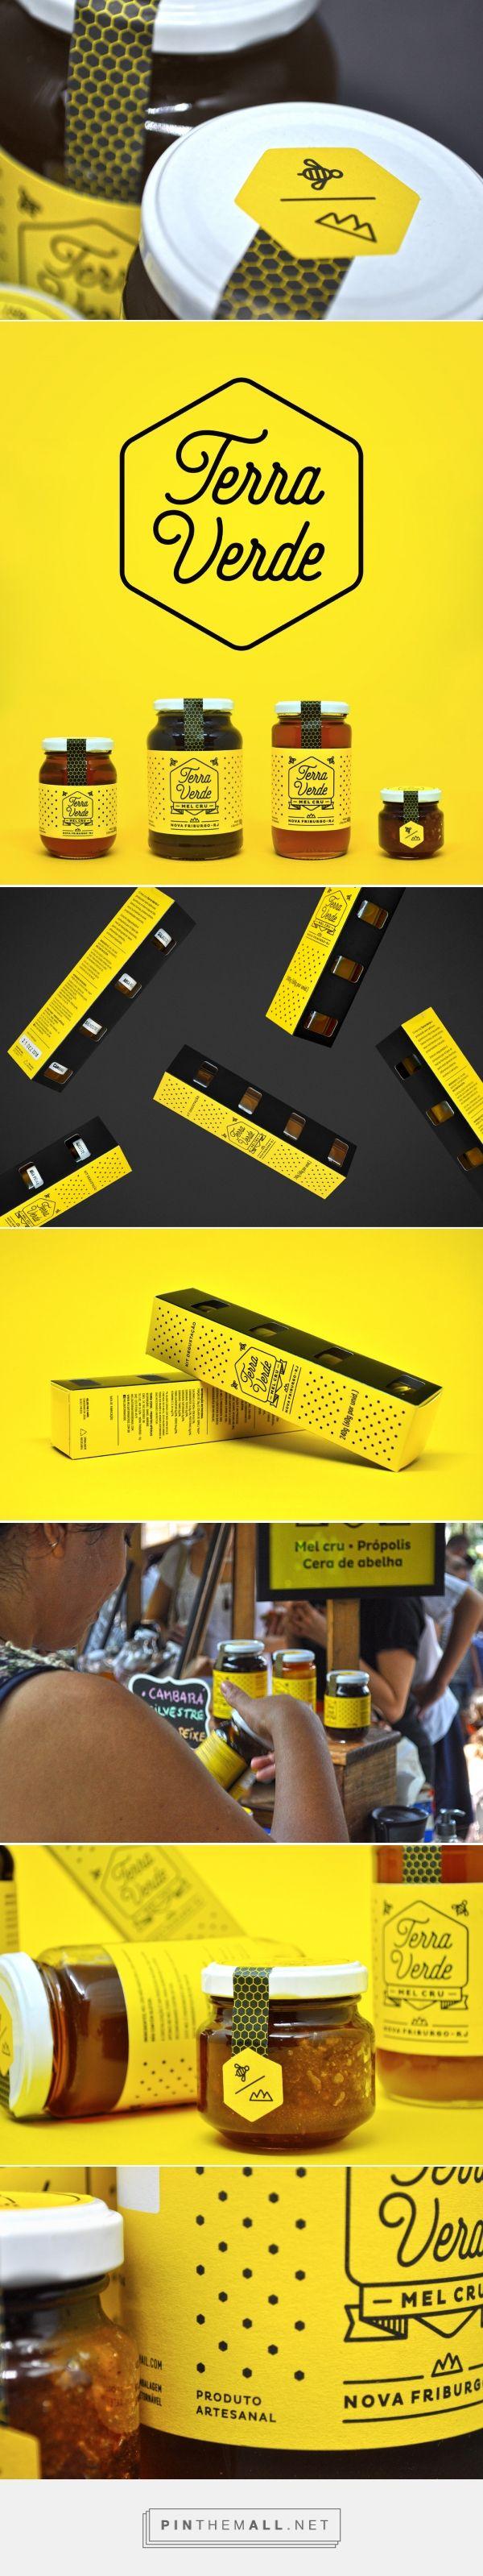 Terra Verde Honey Packaging by Estúdio Insólito | Fivestar Branding Agency – Design and Branding Agency & Curated Inspiration Gallery #honey #honeypackaging #packaging #package #packagingdesign #design #designinspiration #packaginginspiration